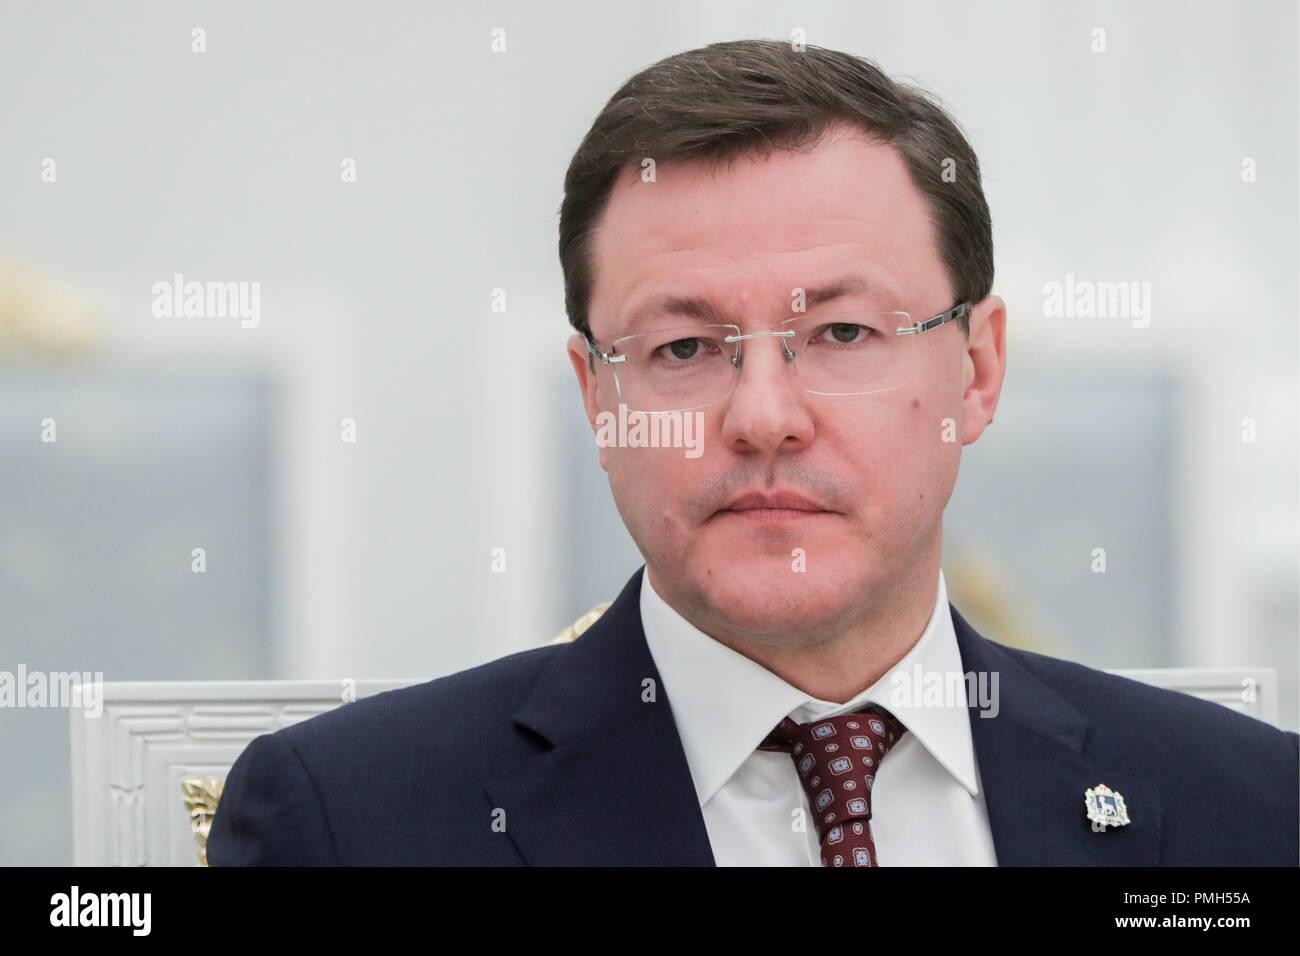 President elects new heads of Karelia, Sverdlovsk and Irkutsk regions 23.05.2012 84